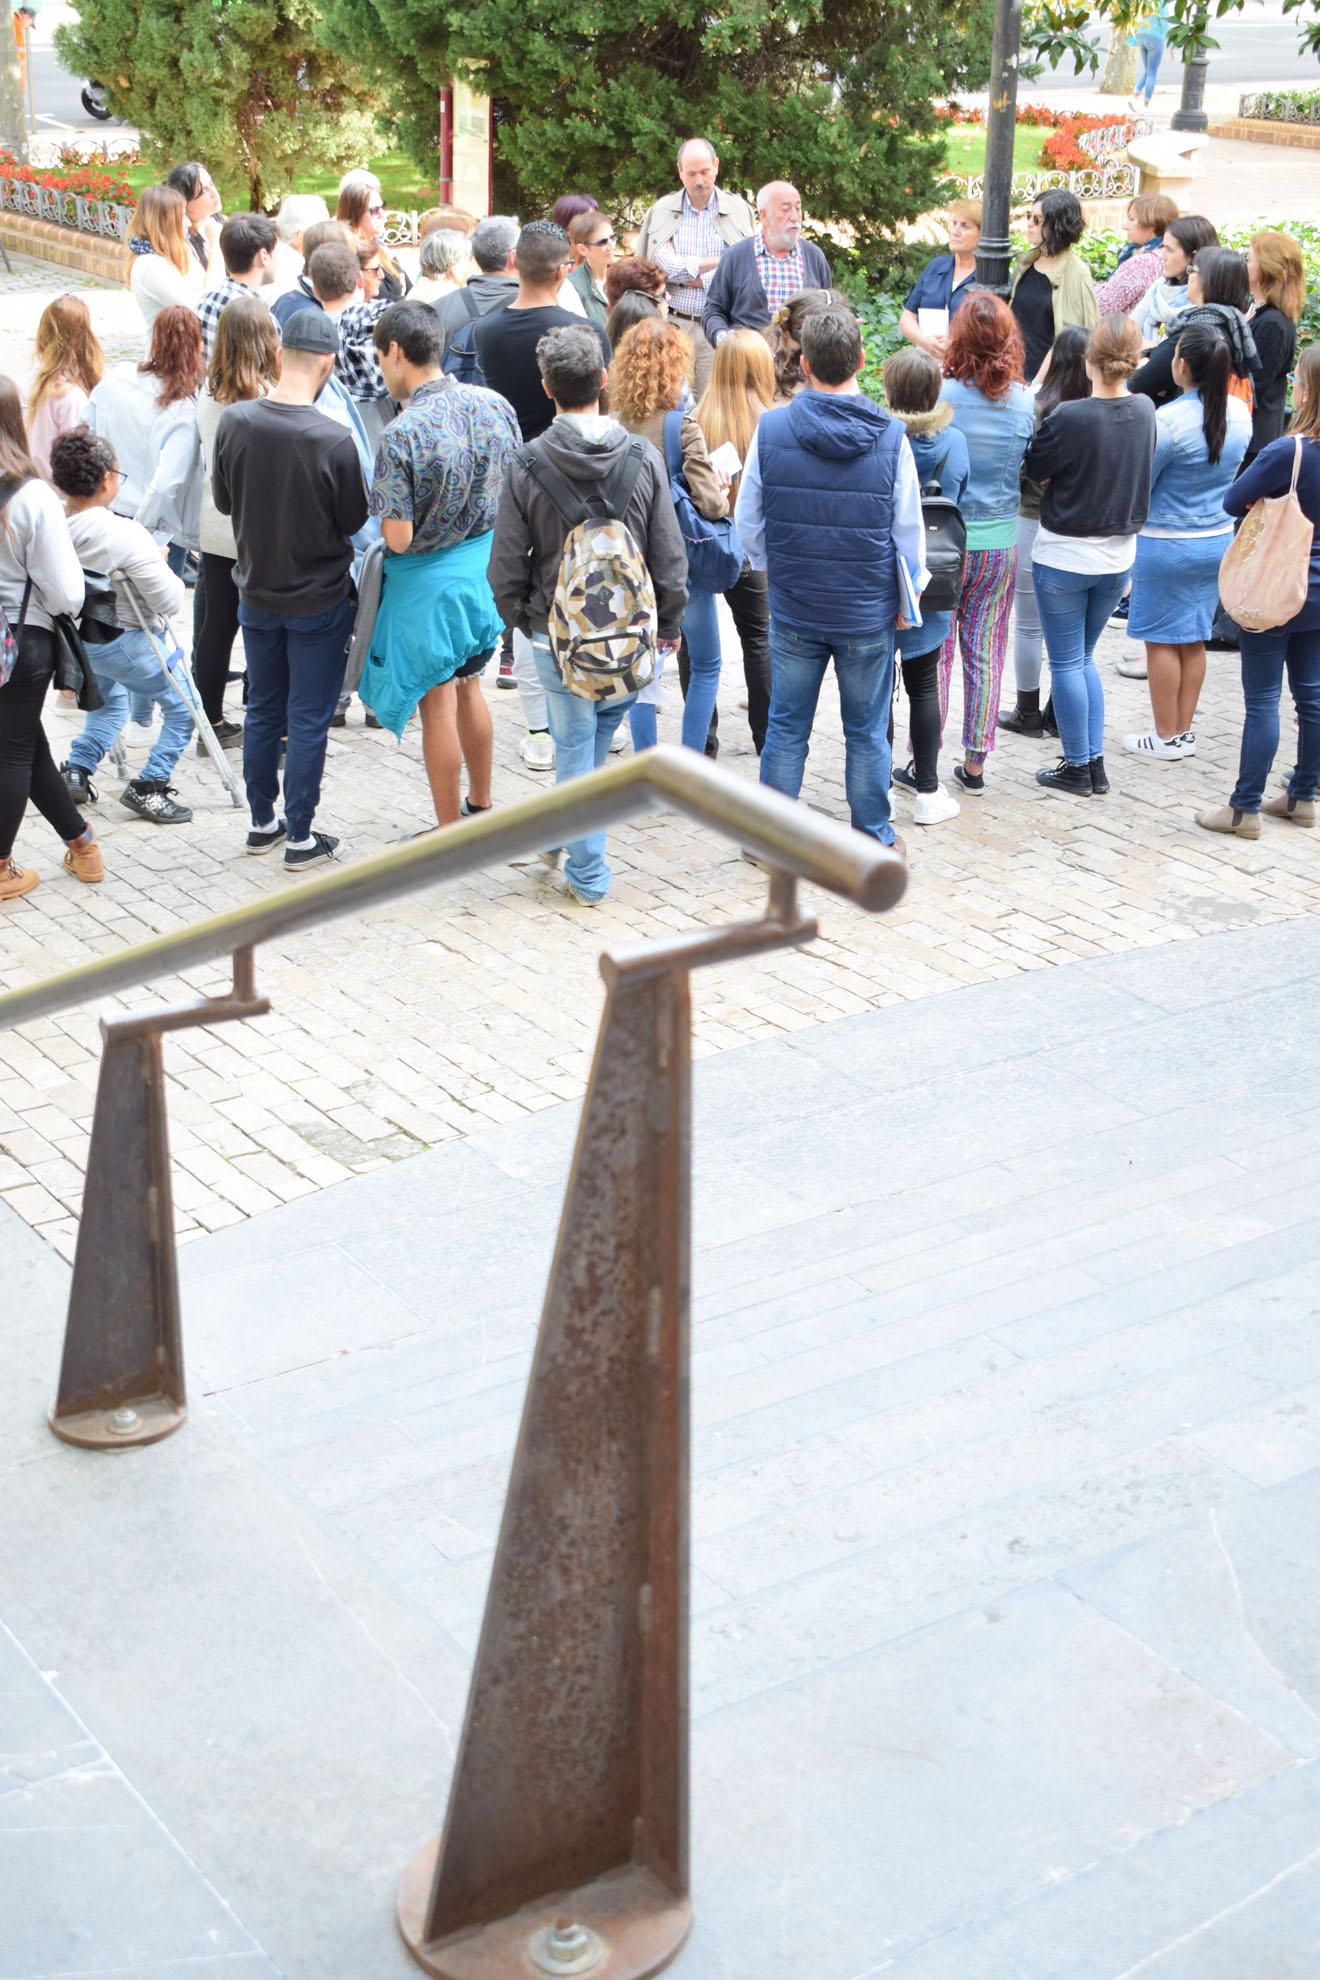 SEMANA-ARQUITECTURA-COAR-FCAR-paseo-espolon-glorieta-plaza-ayuntamiento-jose-miguel-leon (16)